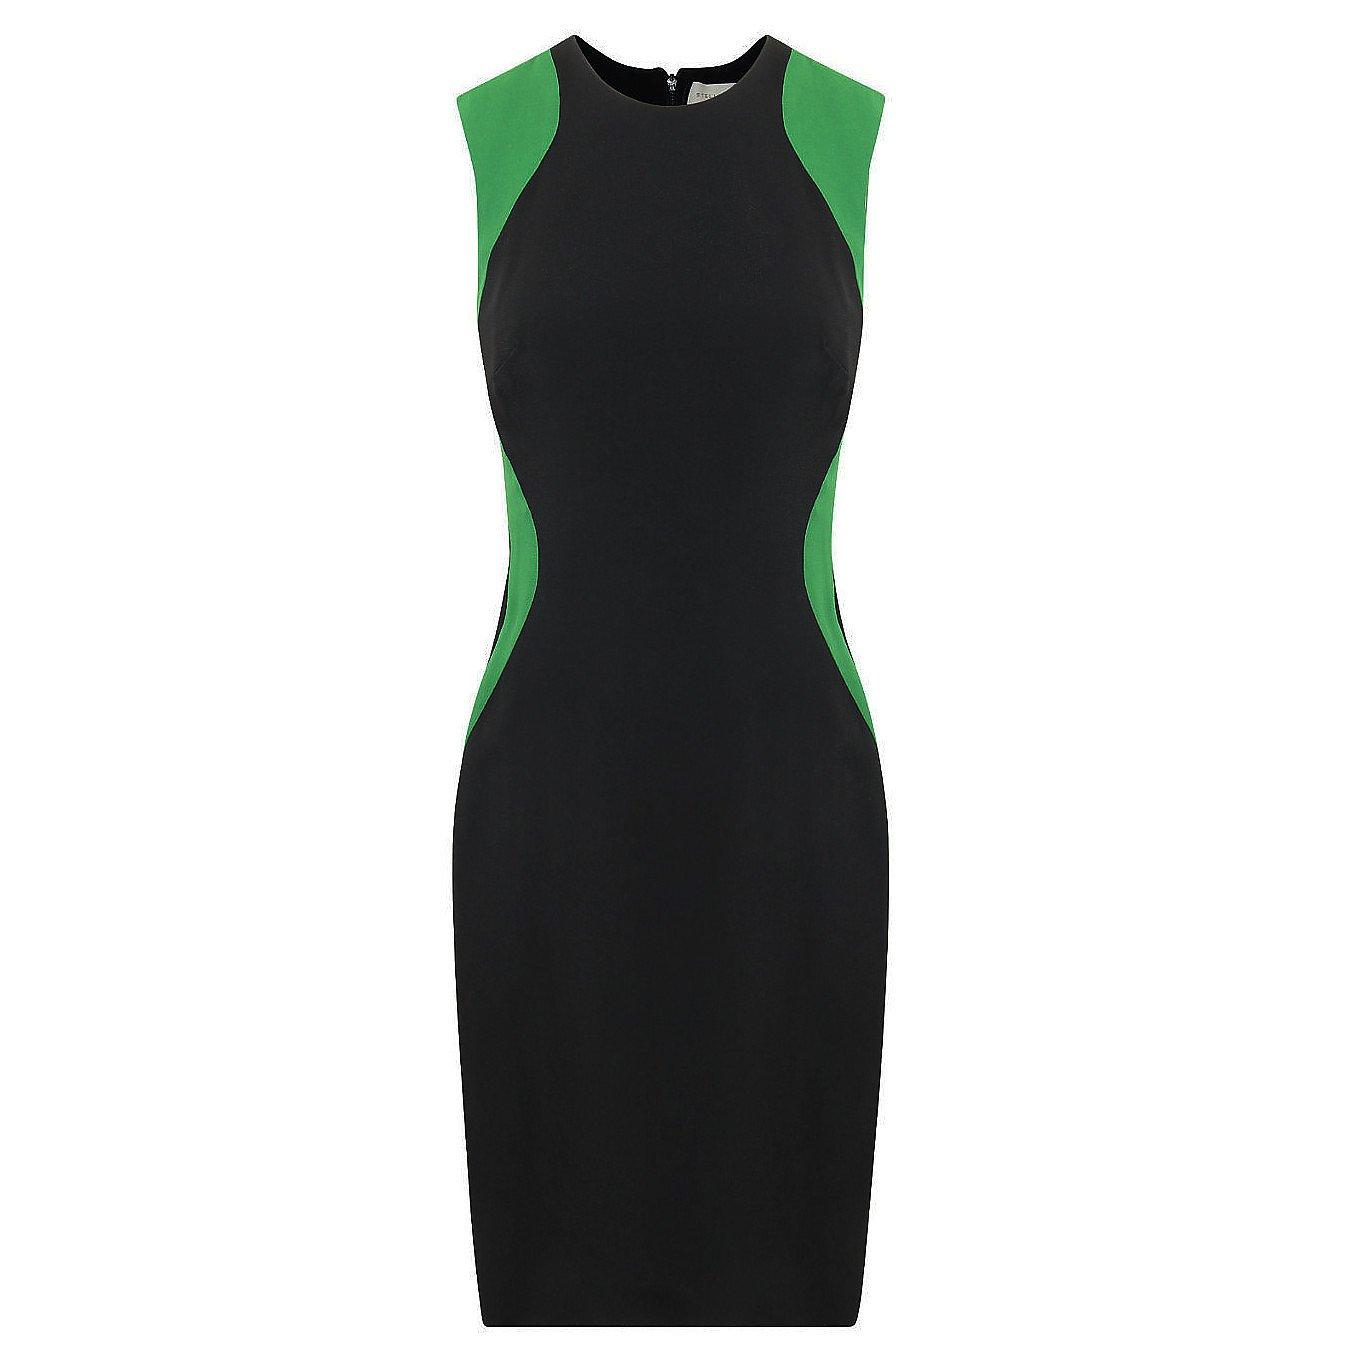 Stella McCartney Contrast Dress